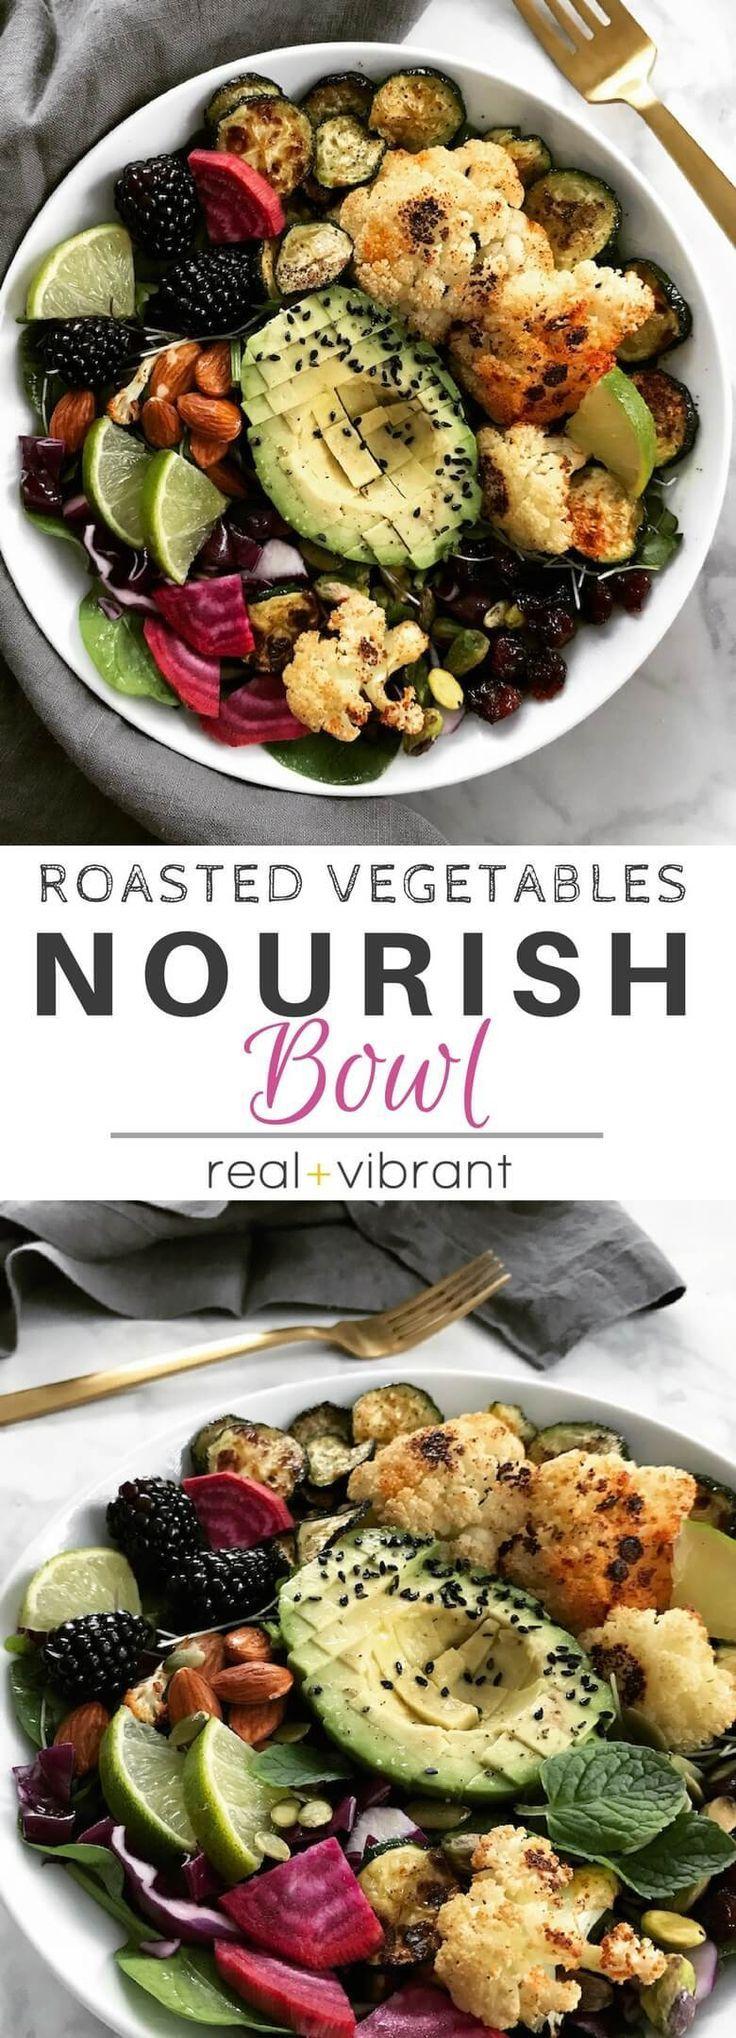 Roasted Vegetable Buddha Bowl - Real + Vibrant